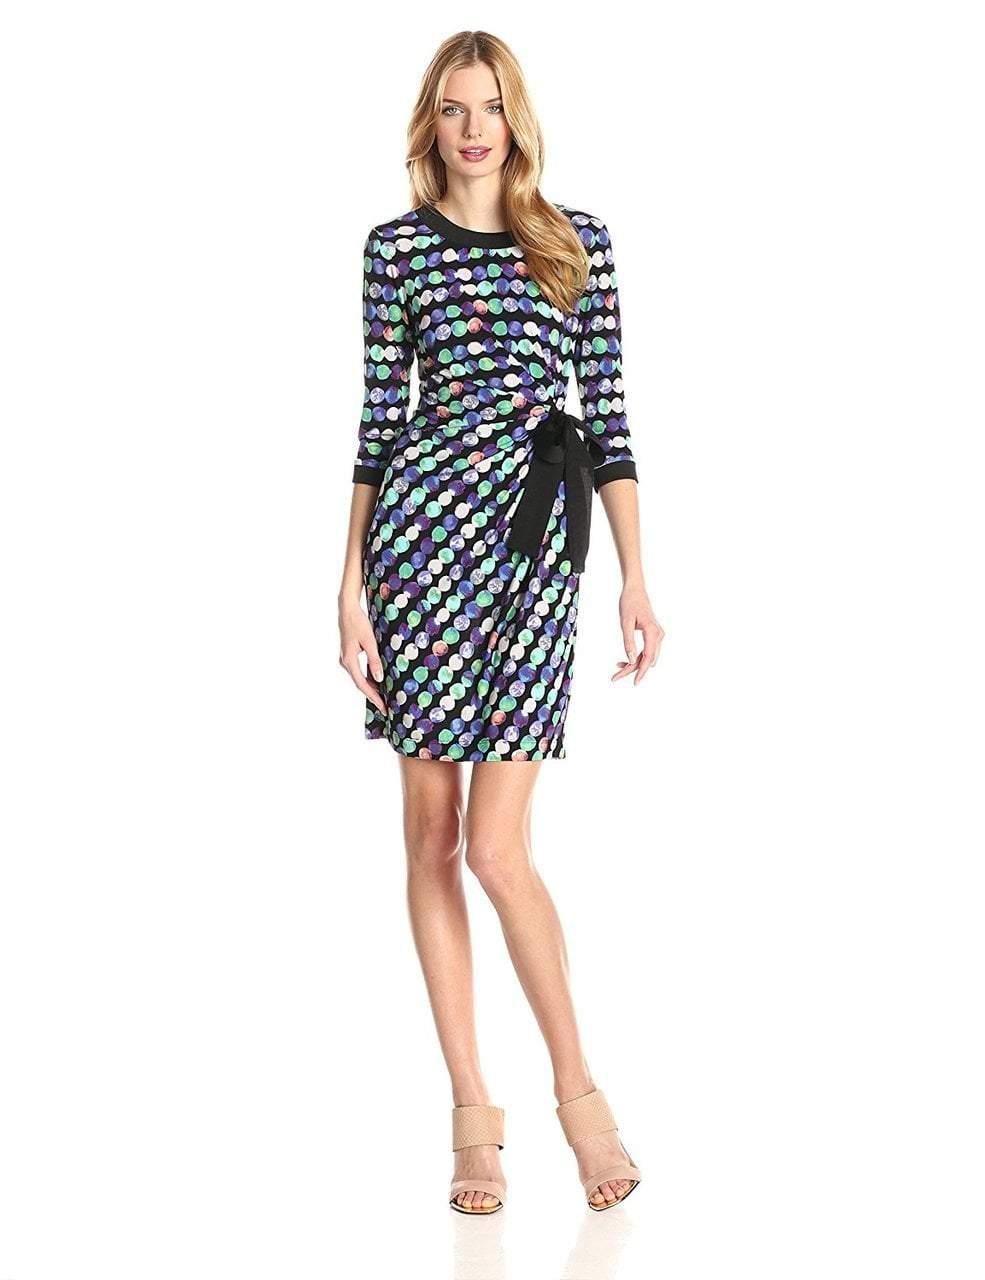 Taylor - Printed Jewel Neck Dress 5250M